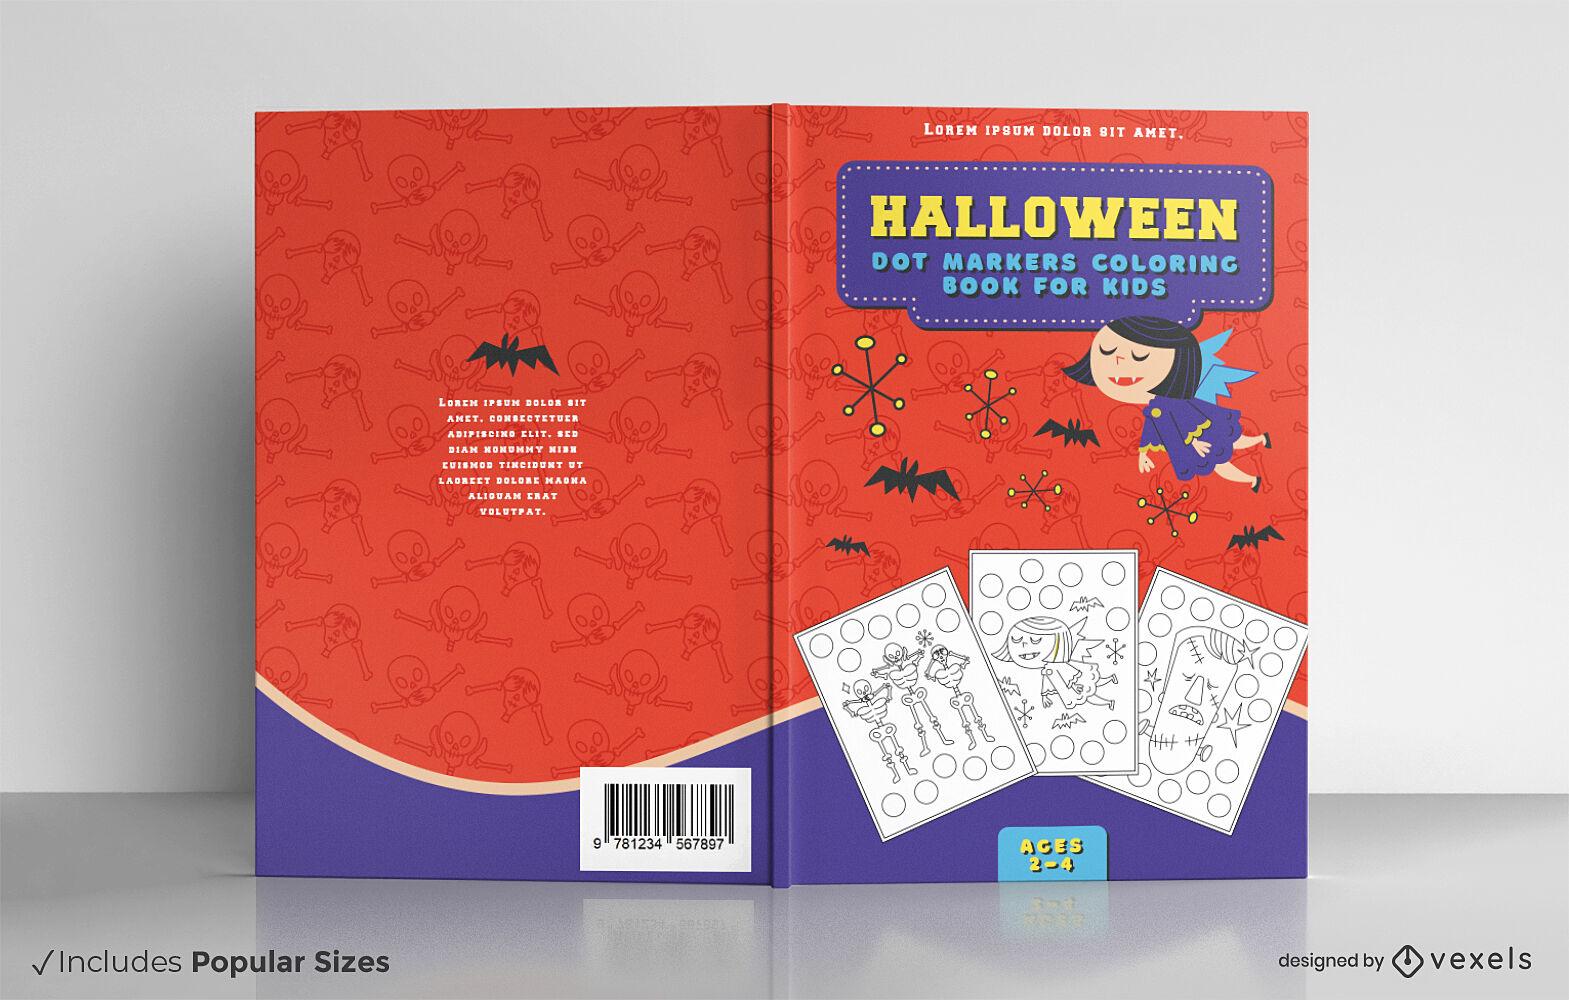 Kinder-Vampir-Halloween-Buchcover-Design